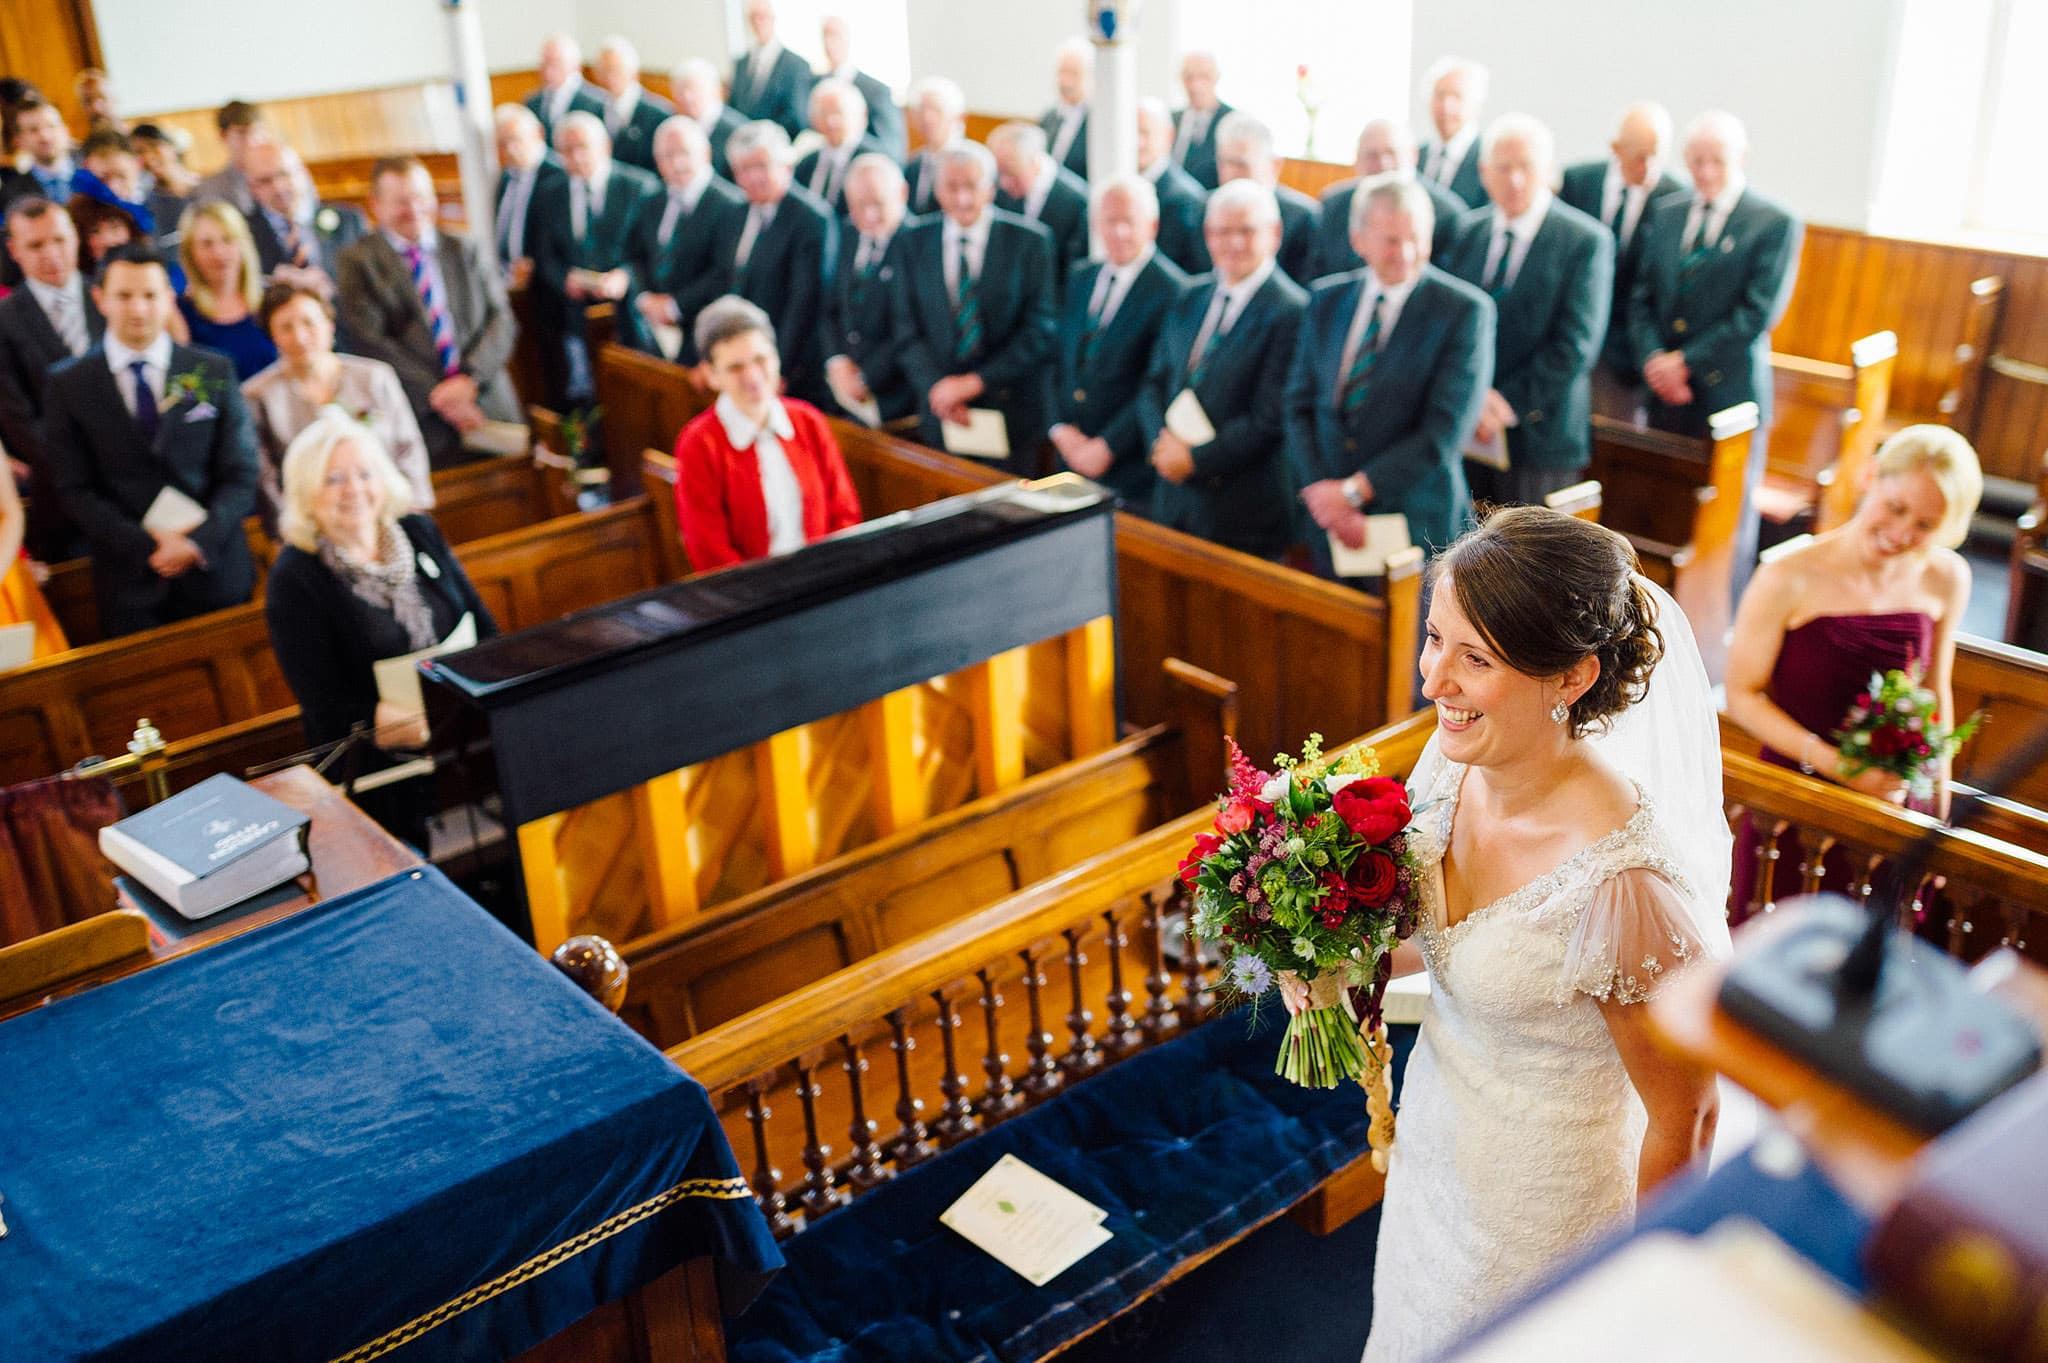 wedding-photographer-aberystwyth-wales (36)